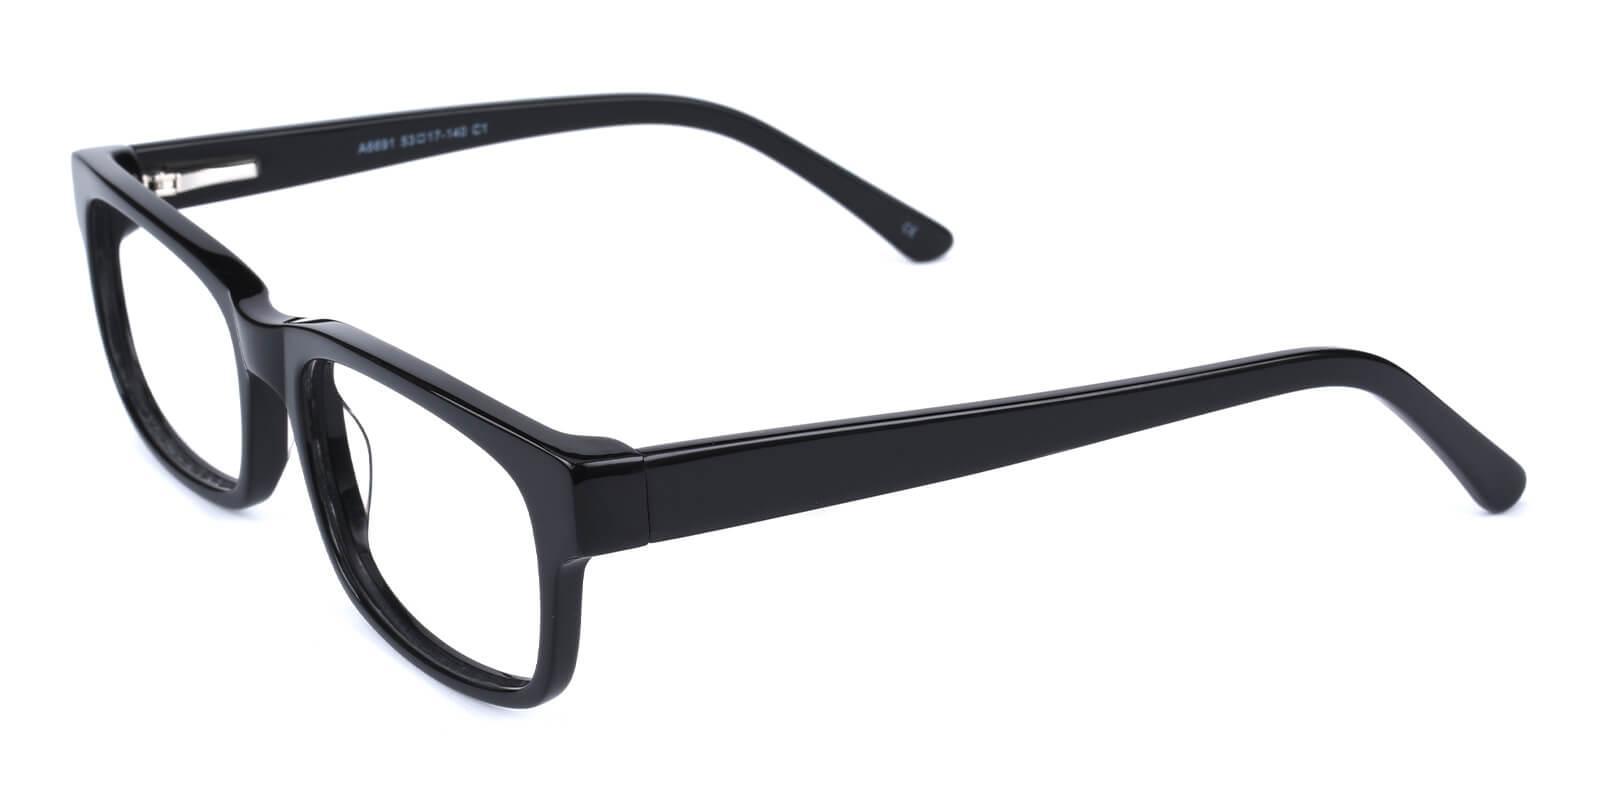 Eware-Black-Rectangle-Acetate-Eyeglasses-additional1